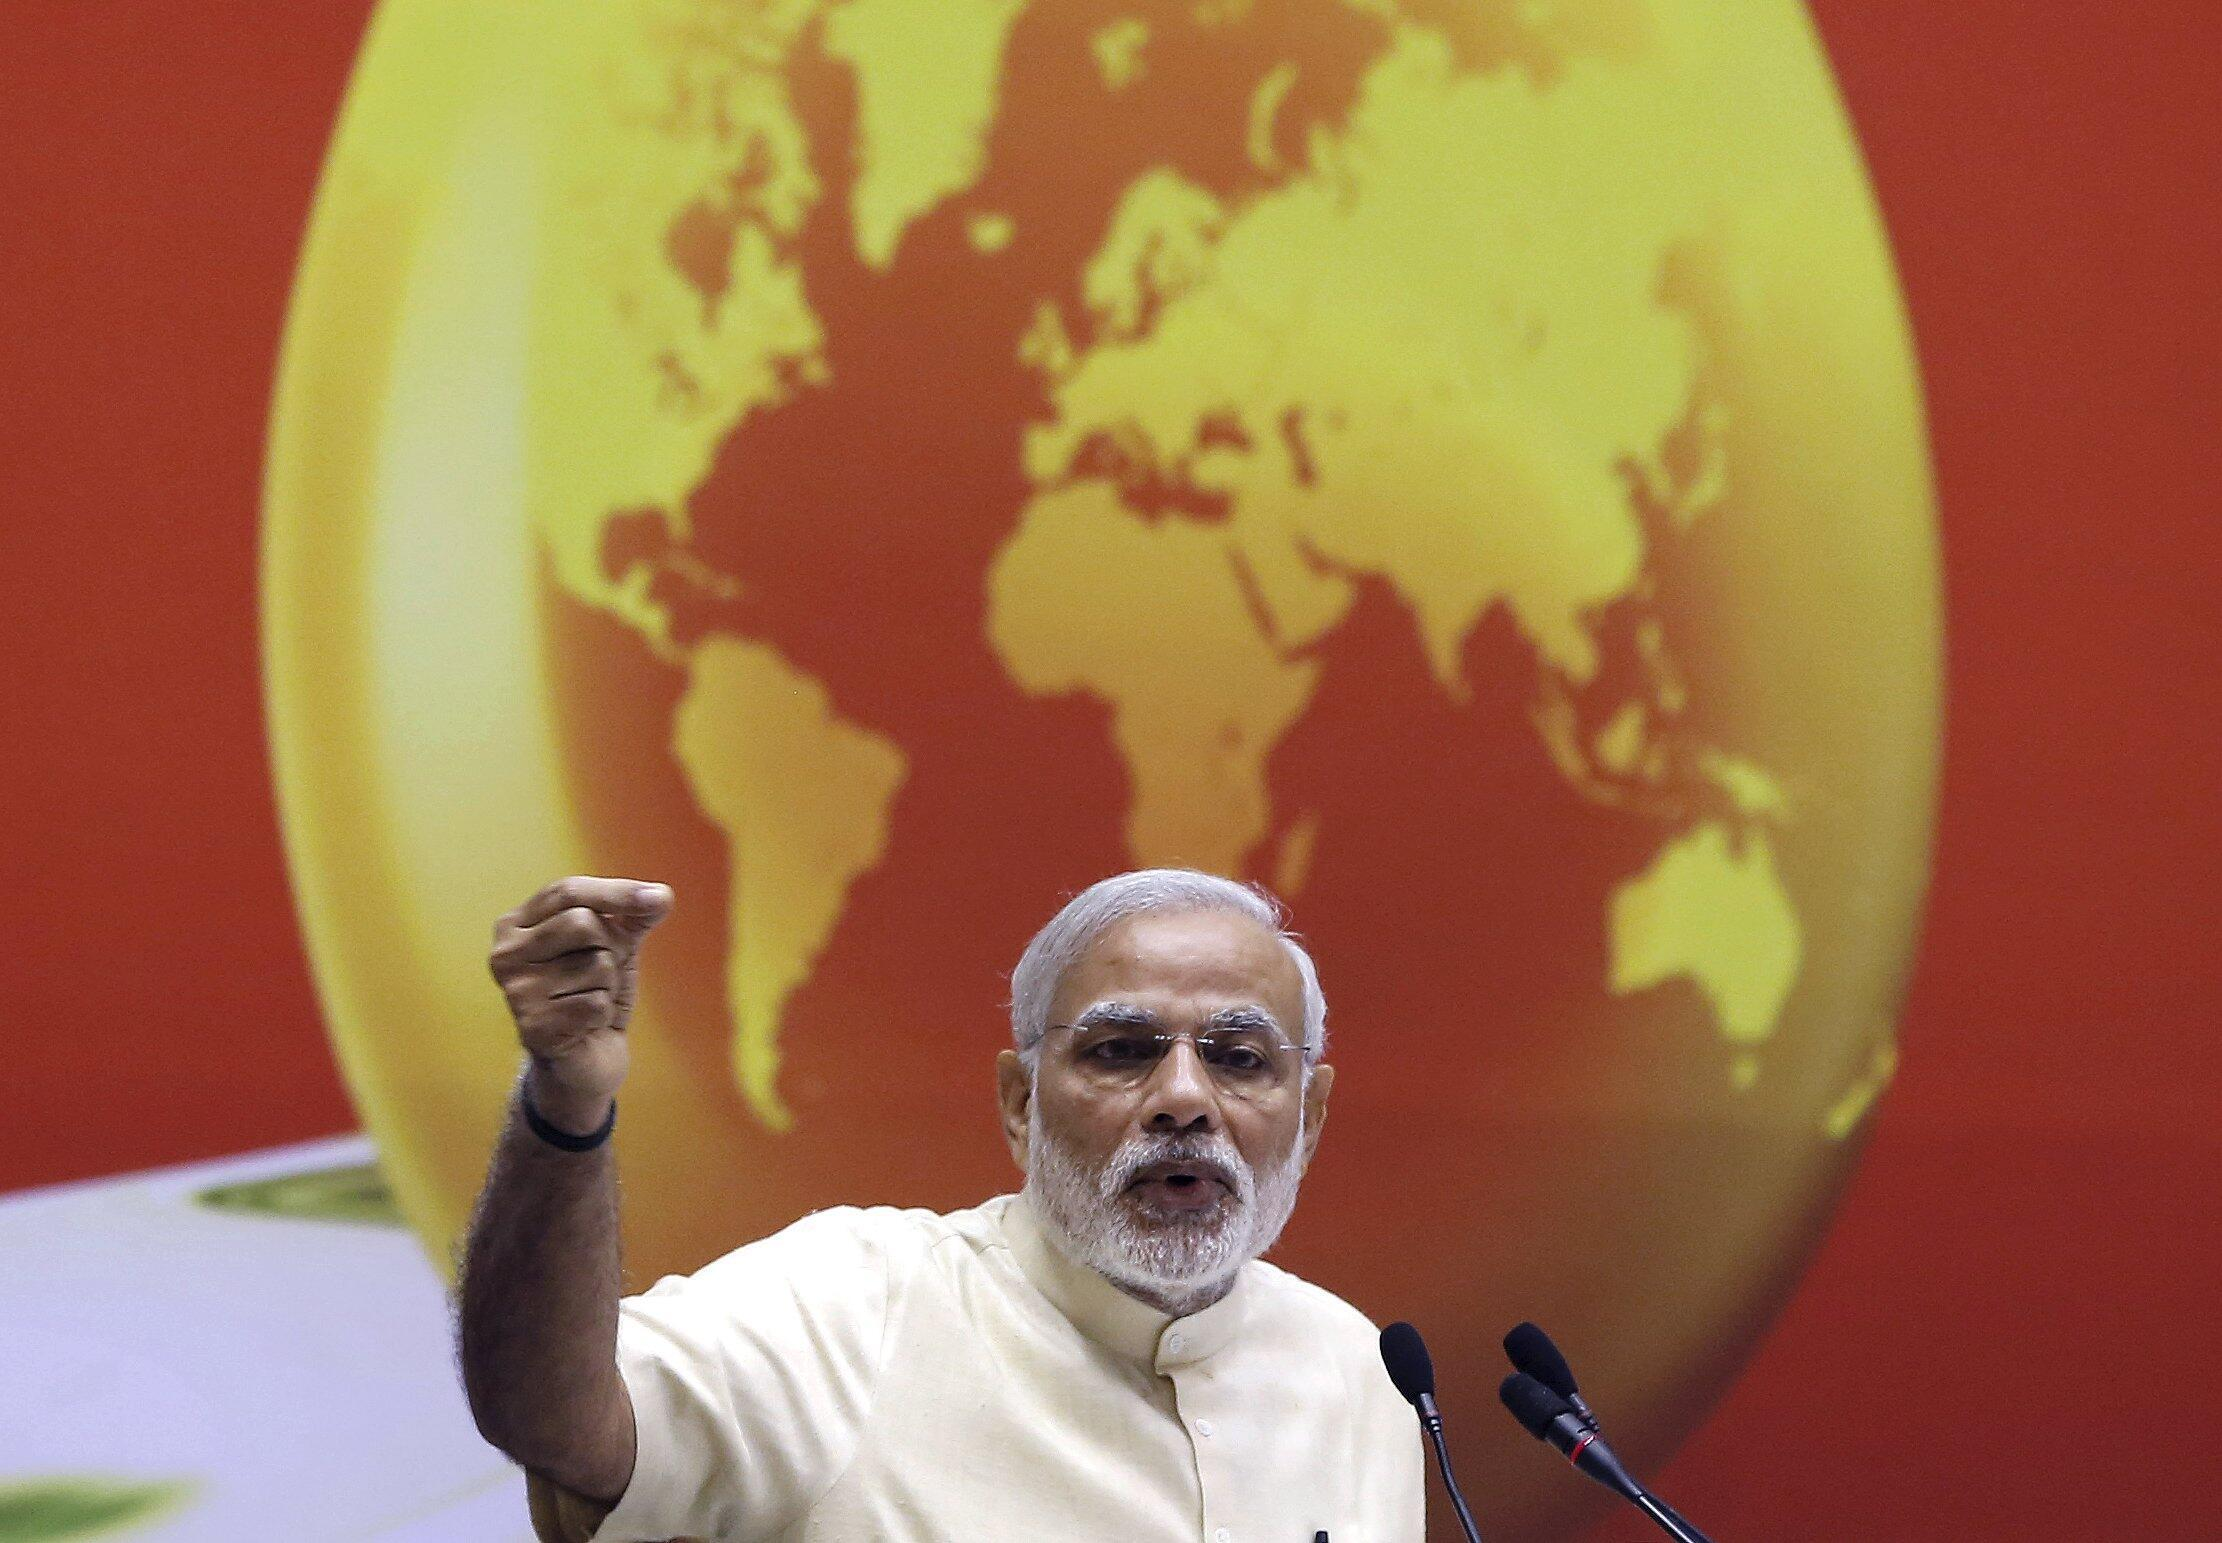 Le Premier ministre indien Narendra Modi, le 27 mars 2015, à New Delhi.